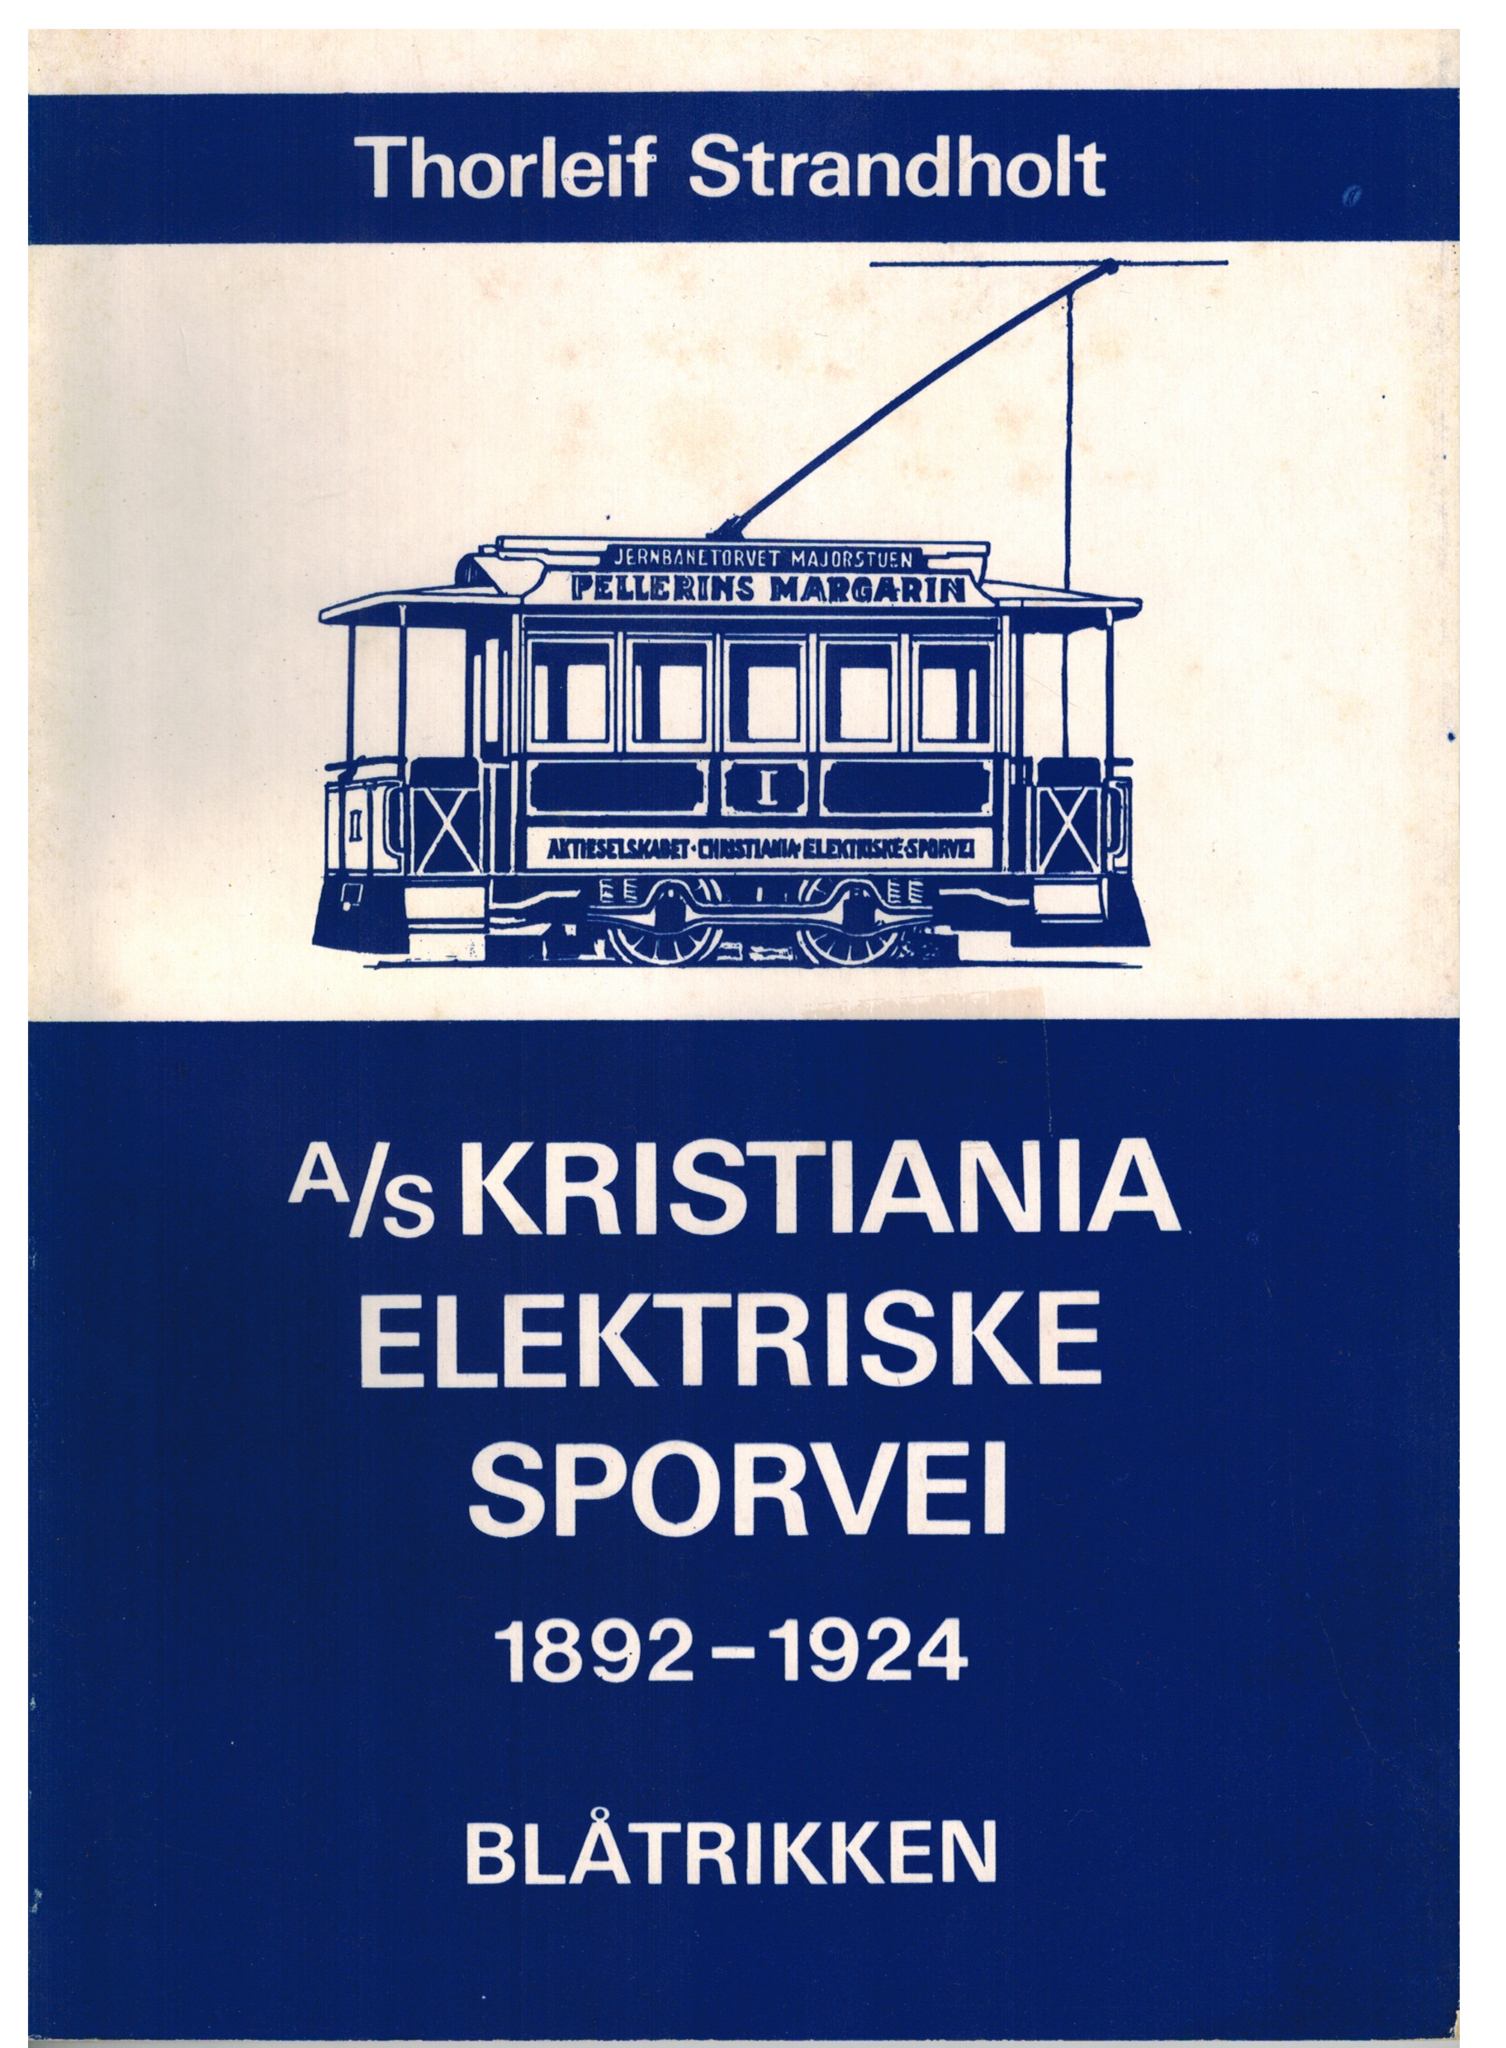 A/S Kristiania Elektriske Sporvei 1892 - 1924